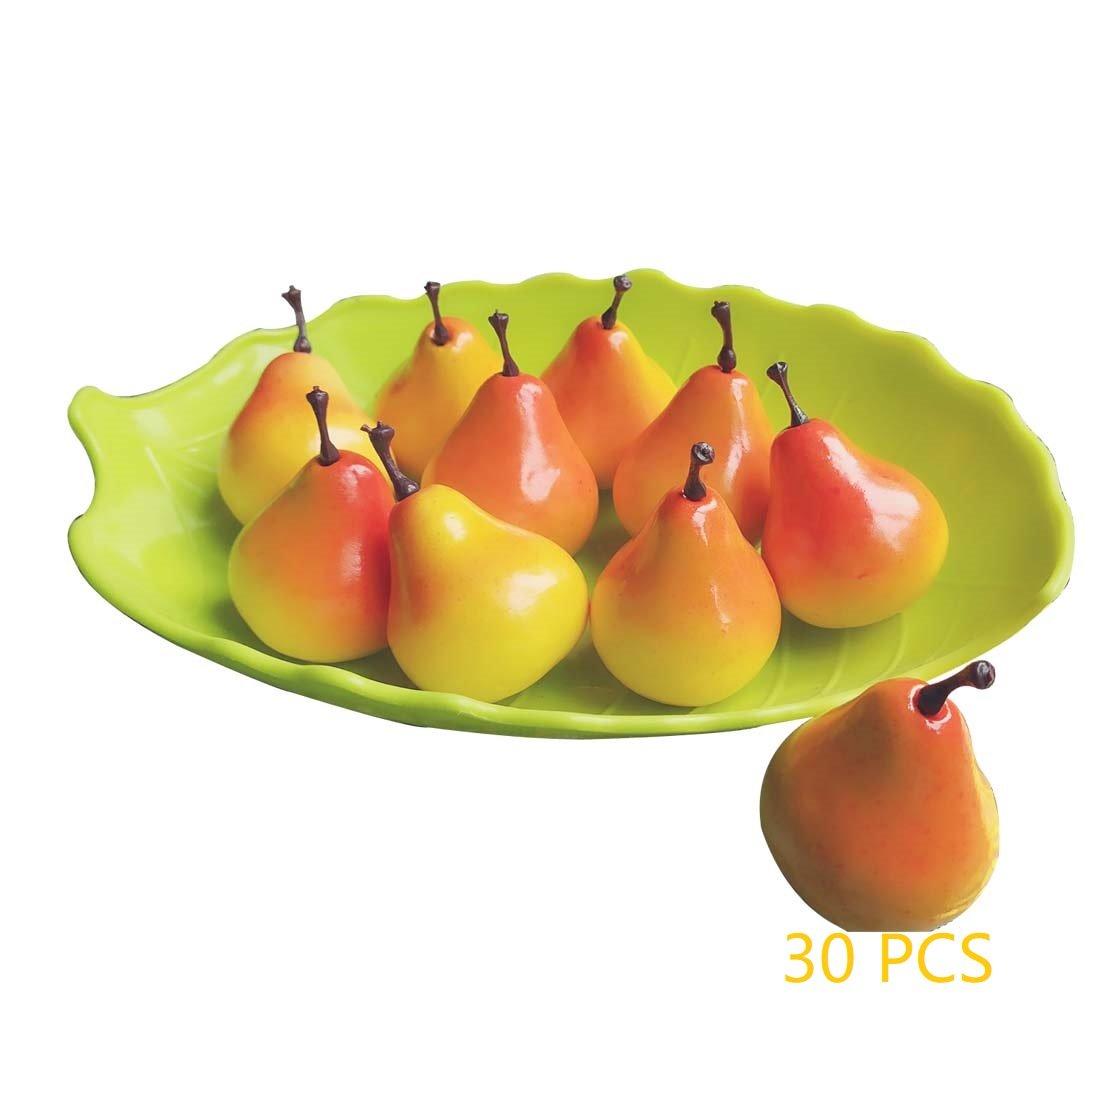 Lorigun 30pcs simulaci/ón Realista Artificial 1.3Mini Peras Frutas Falsas Accesorios de fotograf/ía Modelo